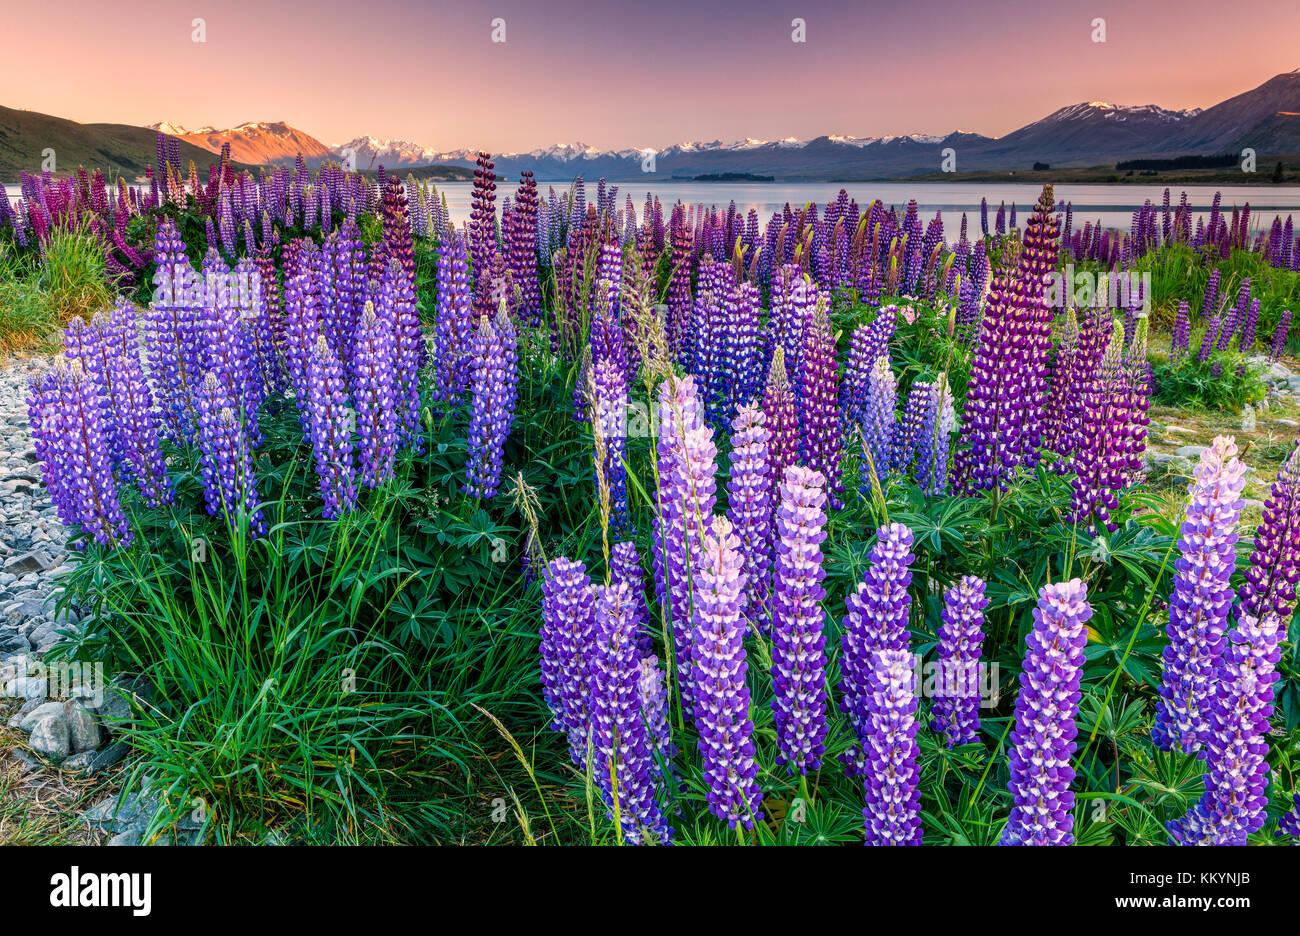 The lupins at Lake Tekapo, Mackenzie Country, New Zealand. - Stock Image